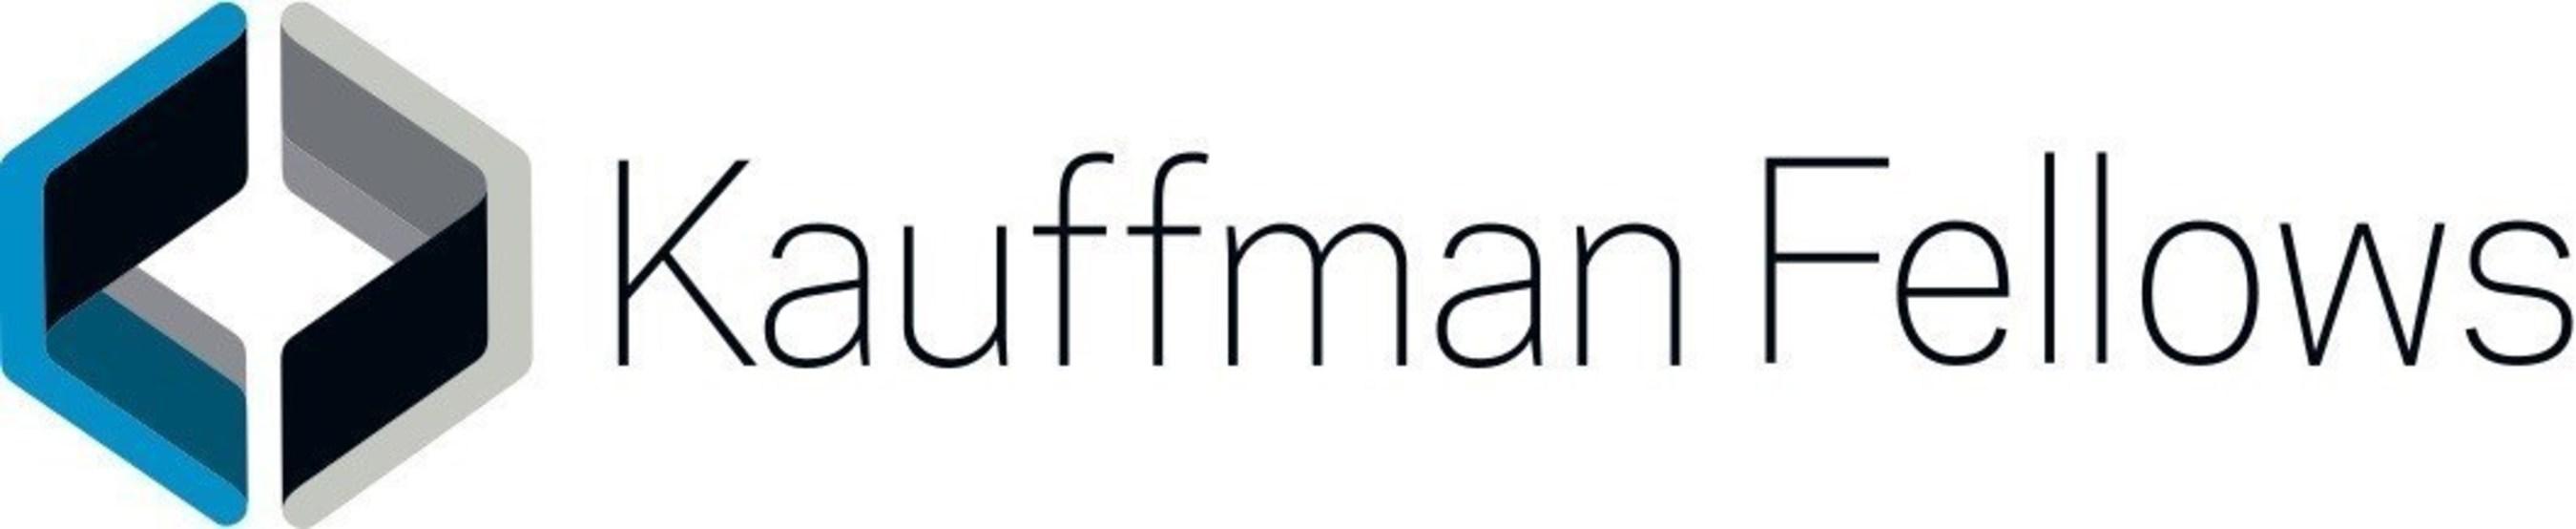 Kauffman Fellows Welcomes Three New Board Members